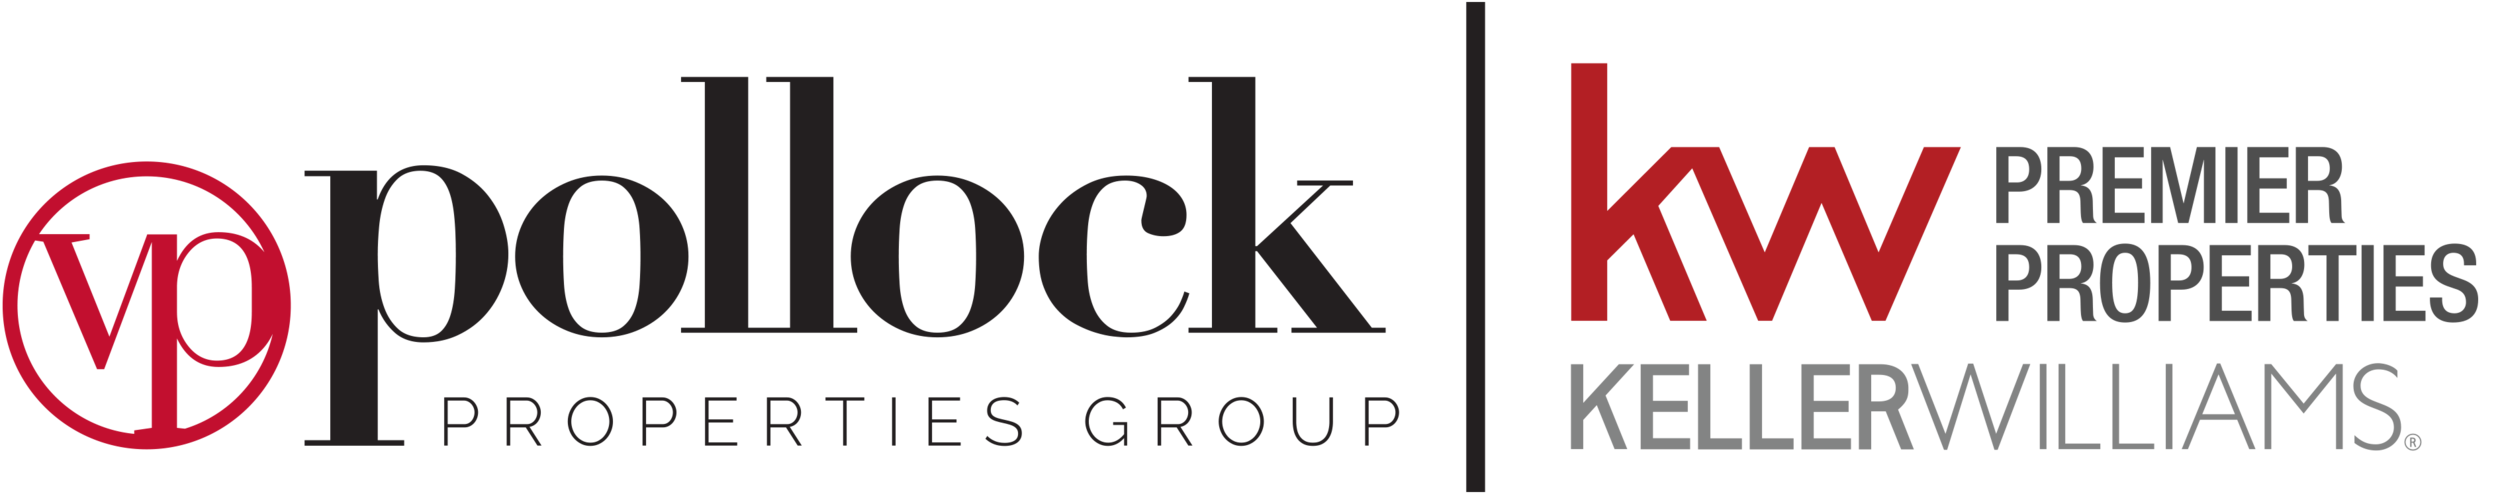 Vanessa Pollock Realty 2018 logo.png